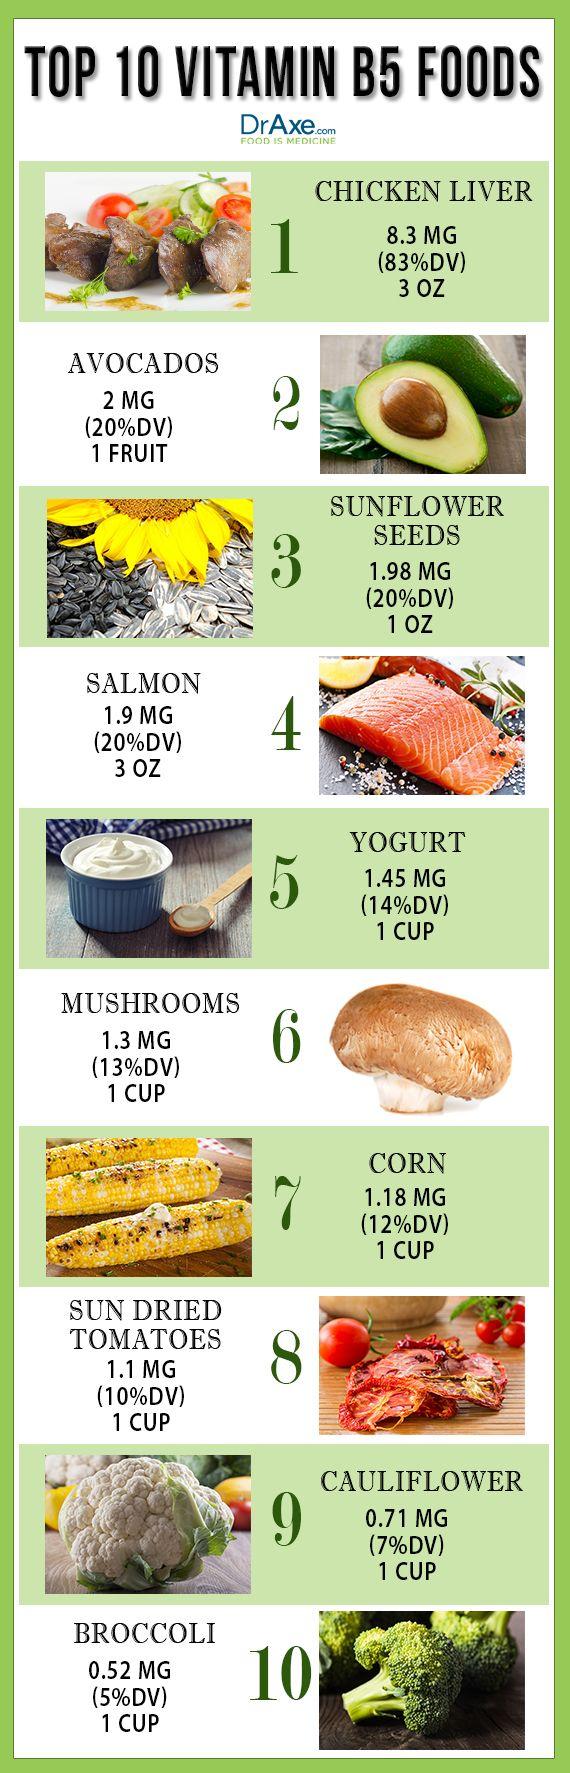 Top 10 vitamin b5 foods pantothenic acid top 10 vitamin b5 foods pantothenic acid draxe healthy hair forumfinder Choice Image